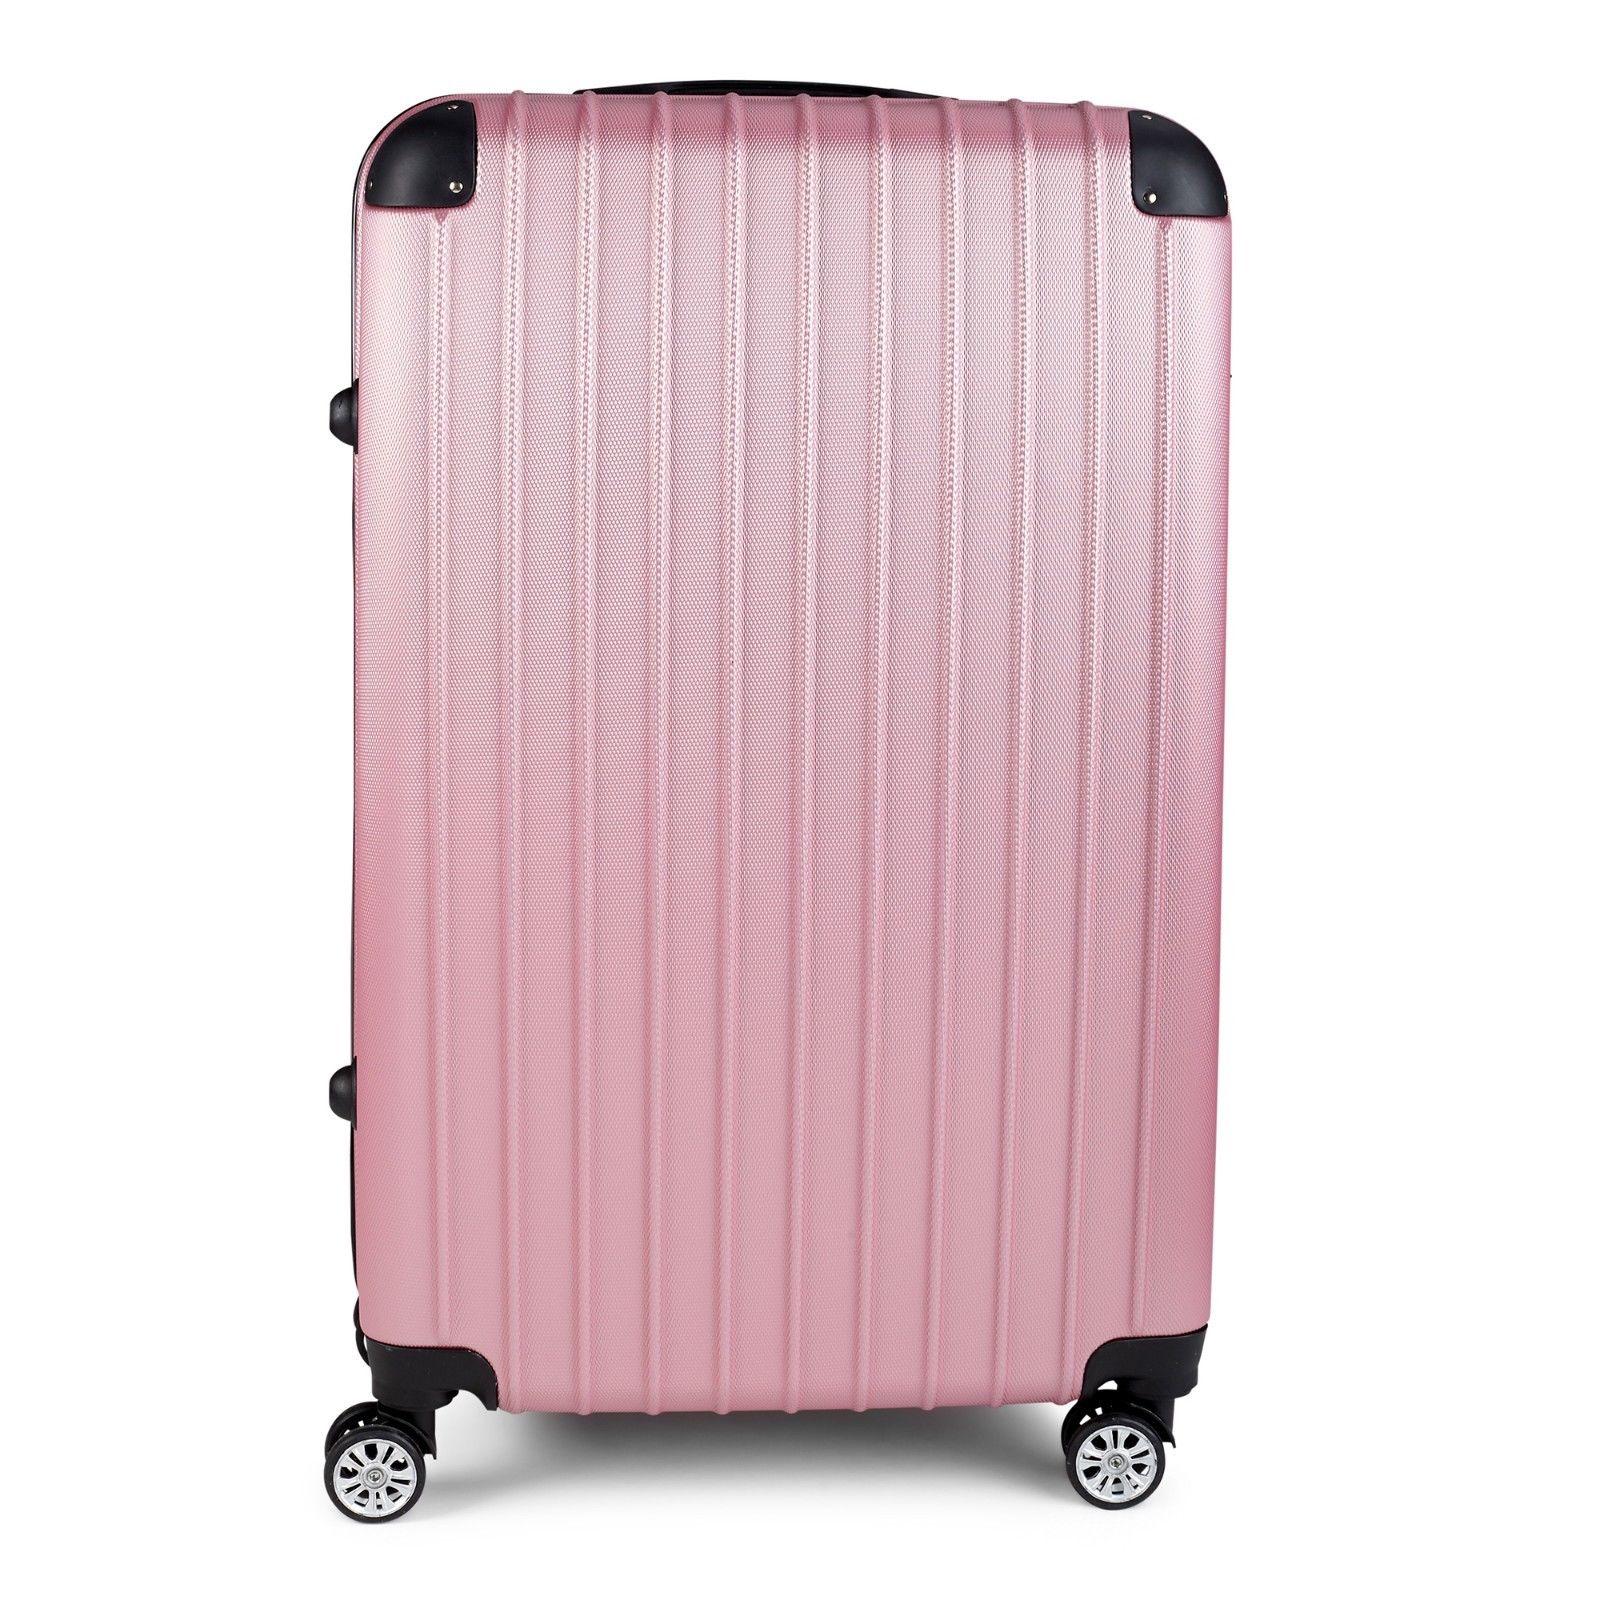 Milano-Premium-3pc-ABS-Luggage-Suitcase-Luxury-Hard-Case-Shockproof-Travel-Set thumbnail 20